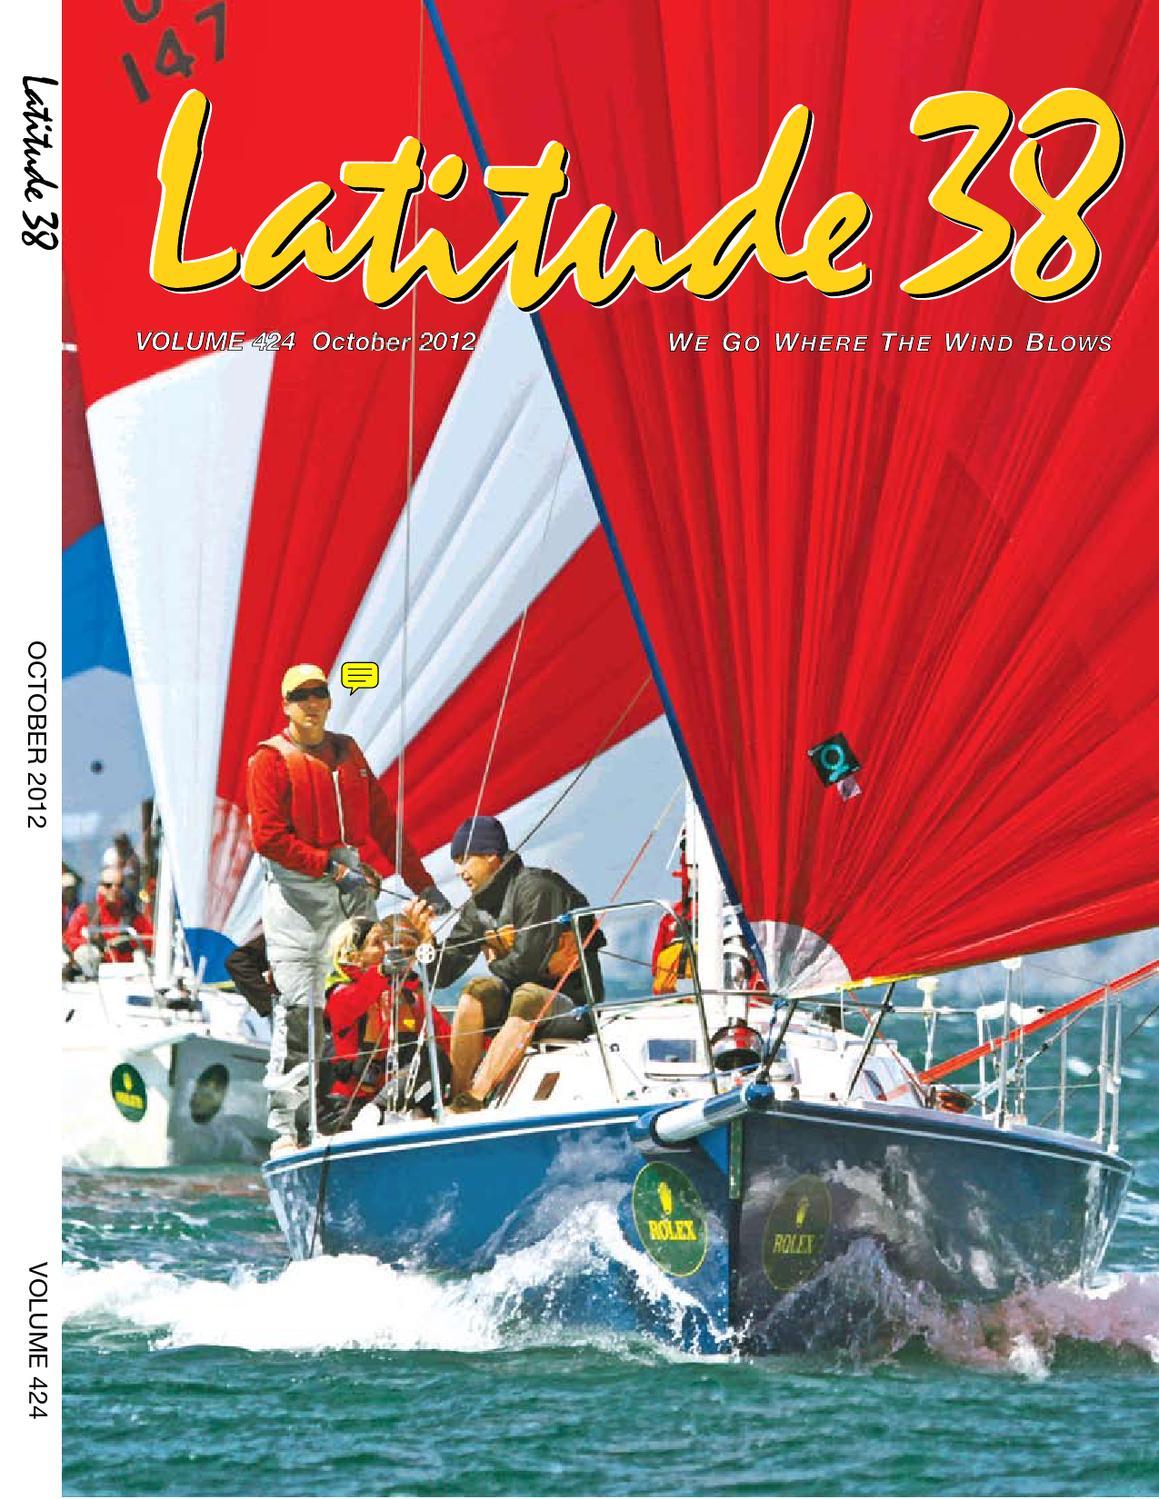 e2f30b6232 Latitude 38 Oct. 2012 by Latitude 38 Media